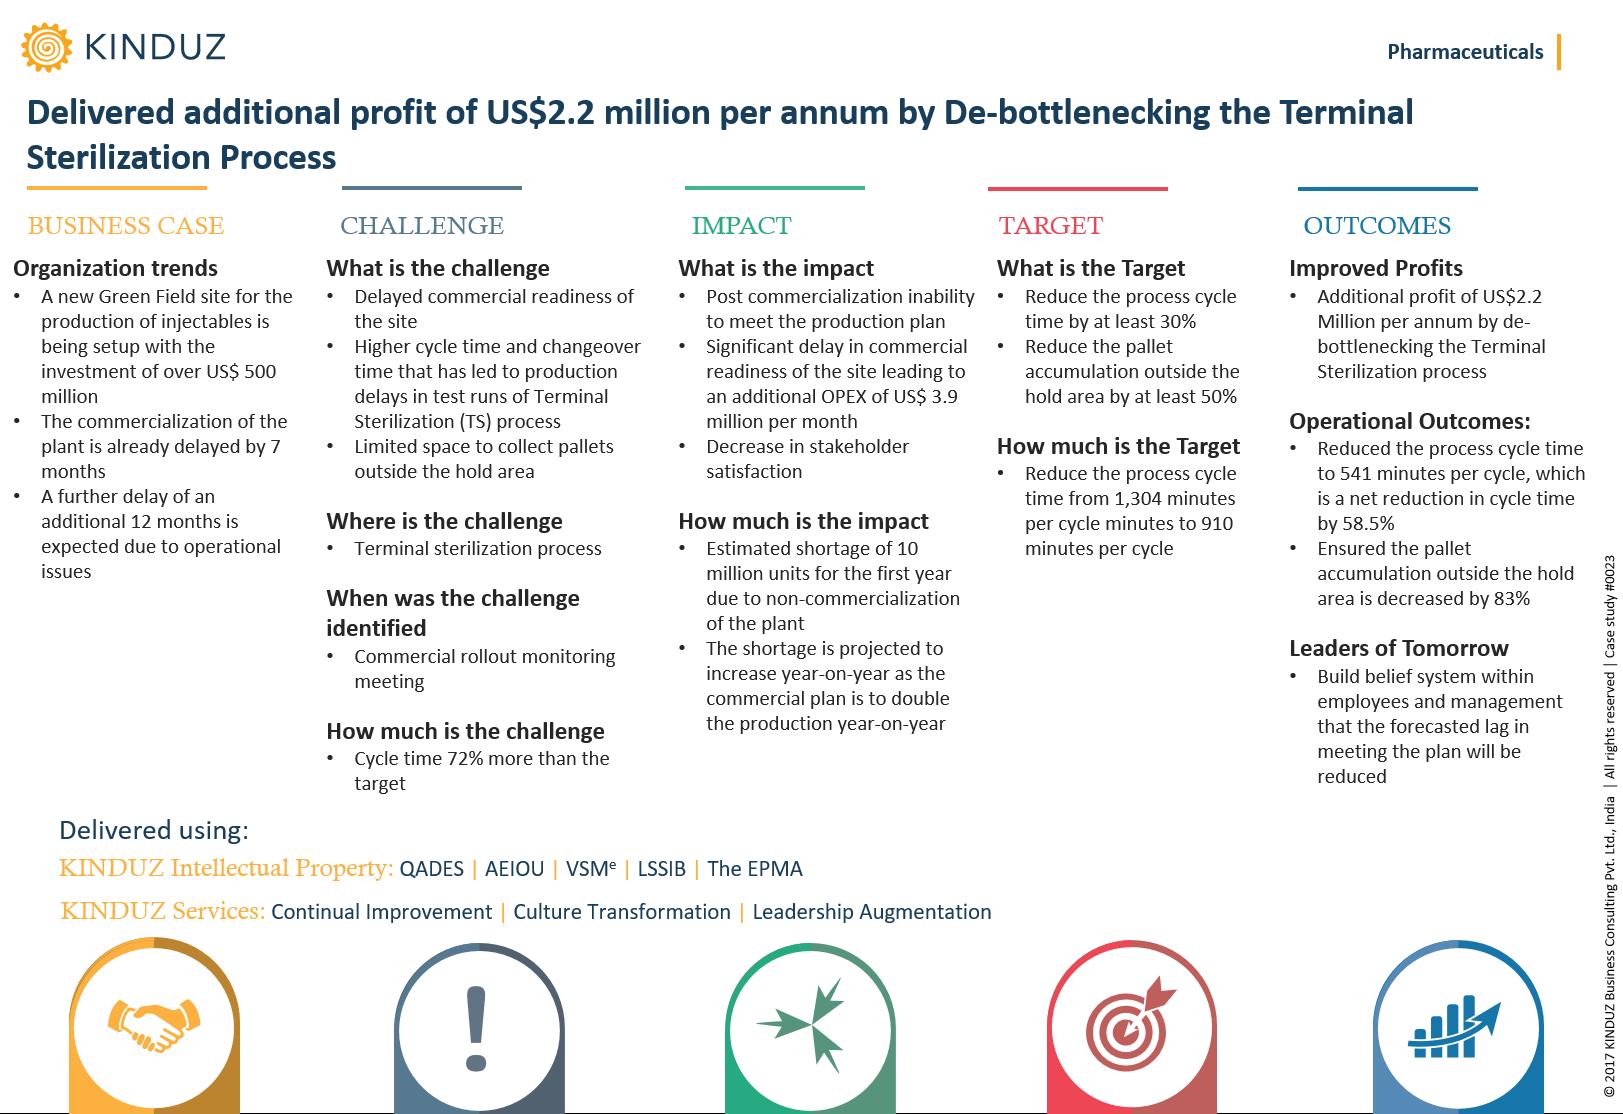 delivered-additional-profit-of-us2.2-million-per-annum-by-de-bottlenecking-the-terminal-sterilization-process